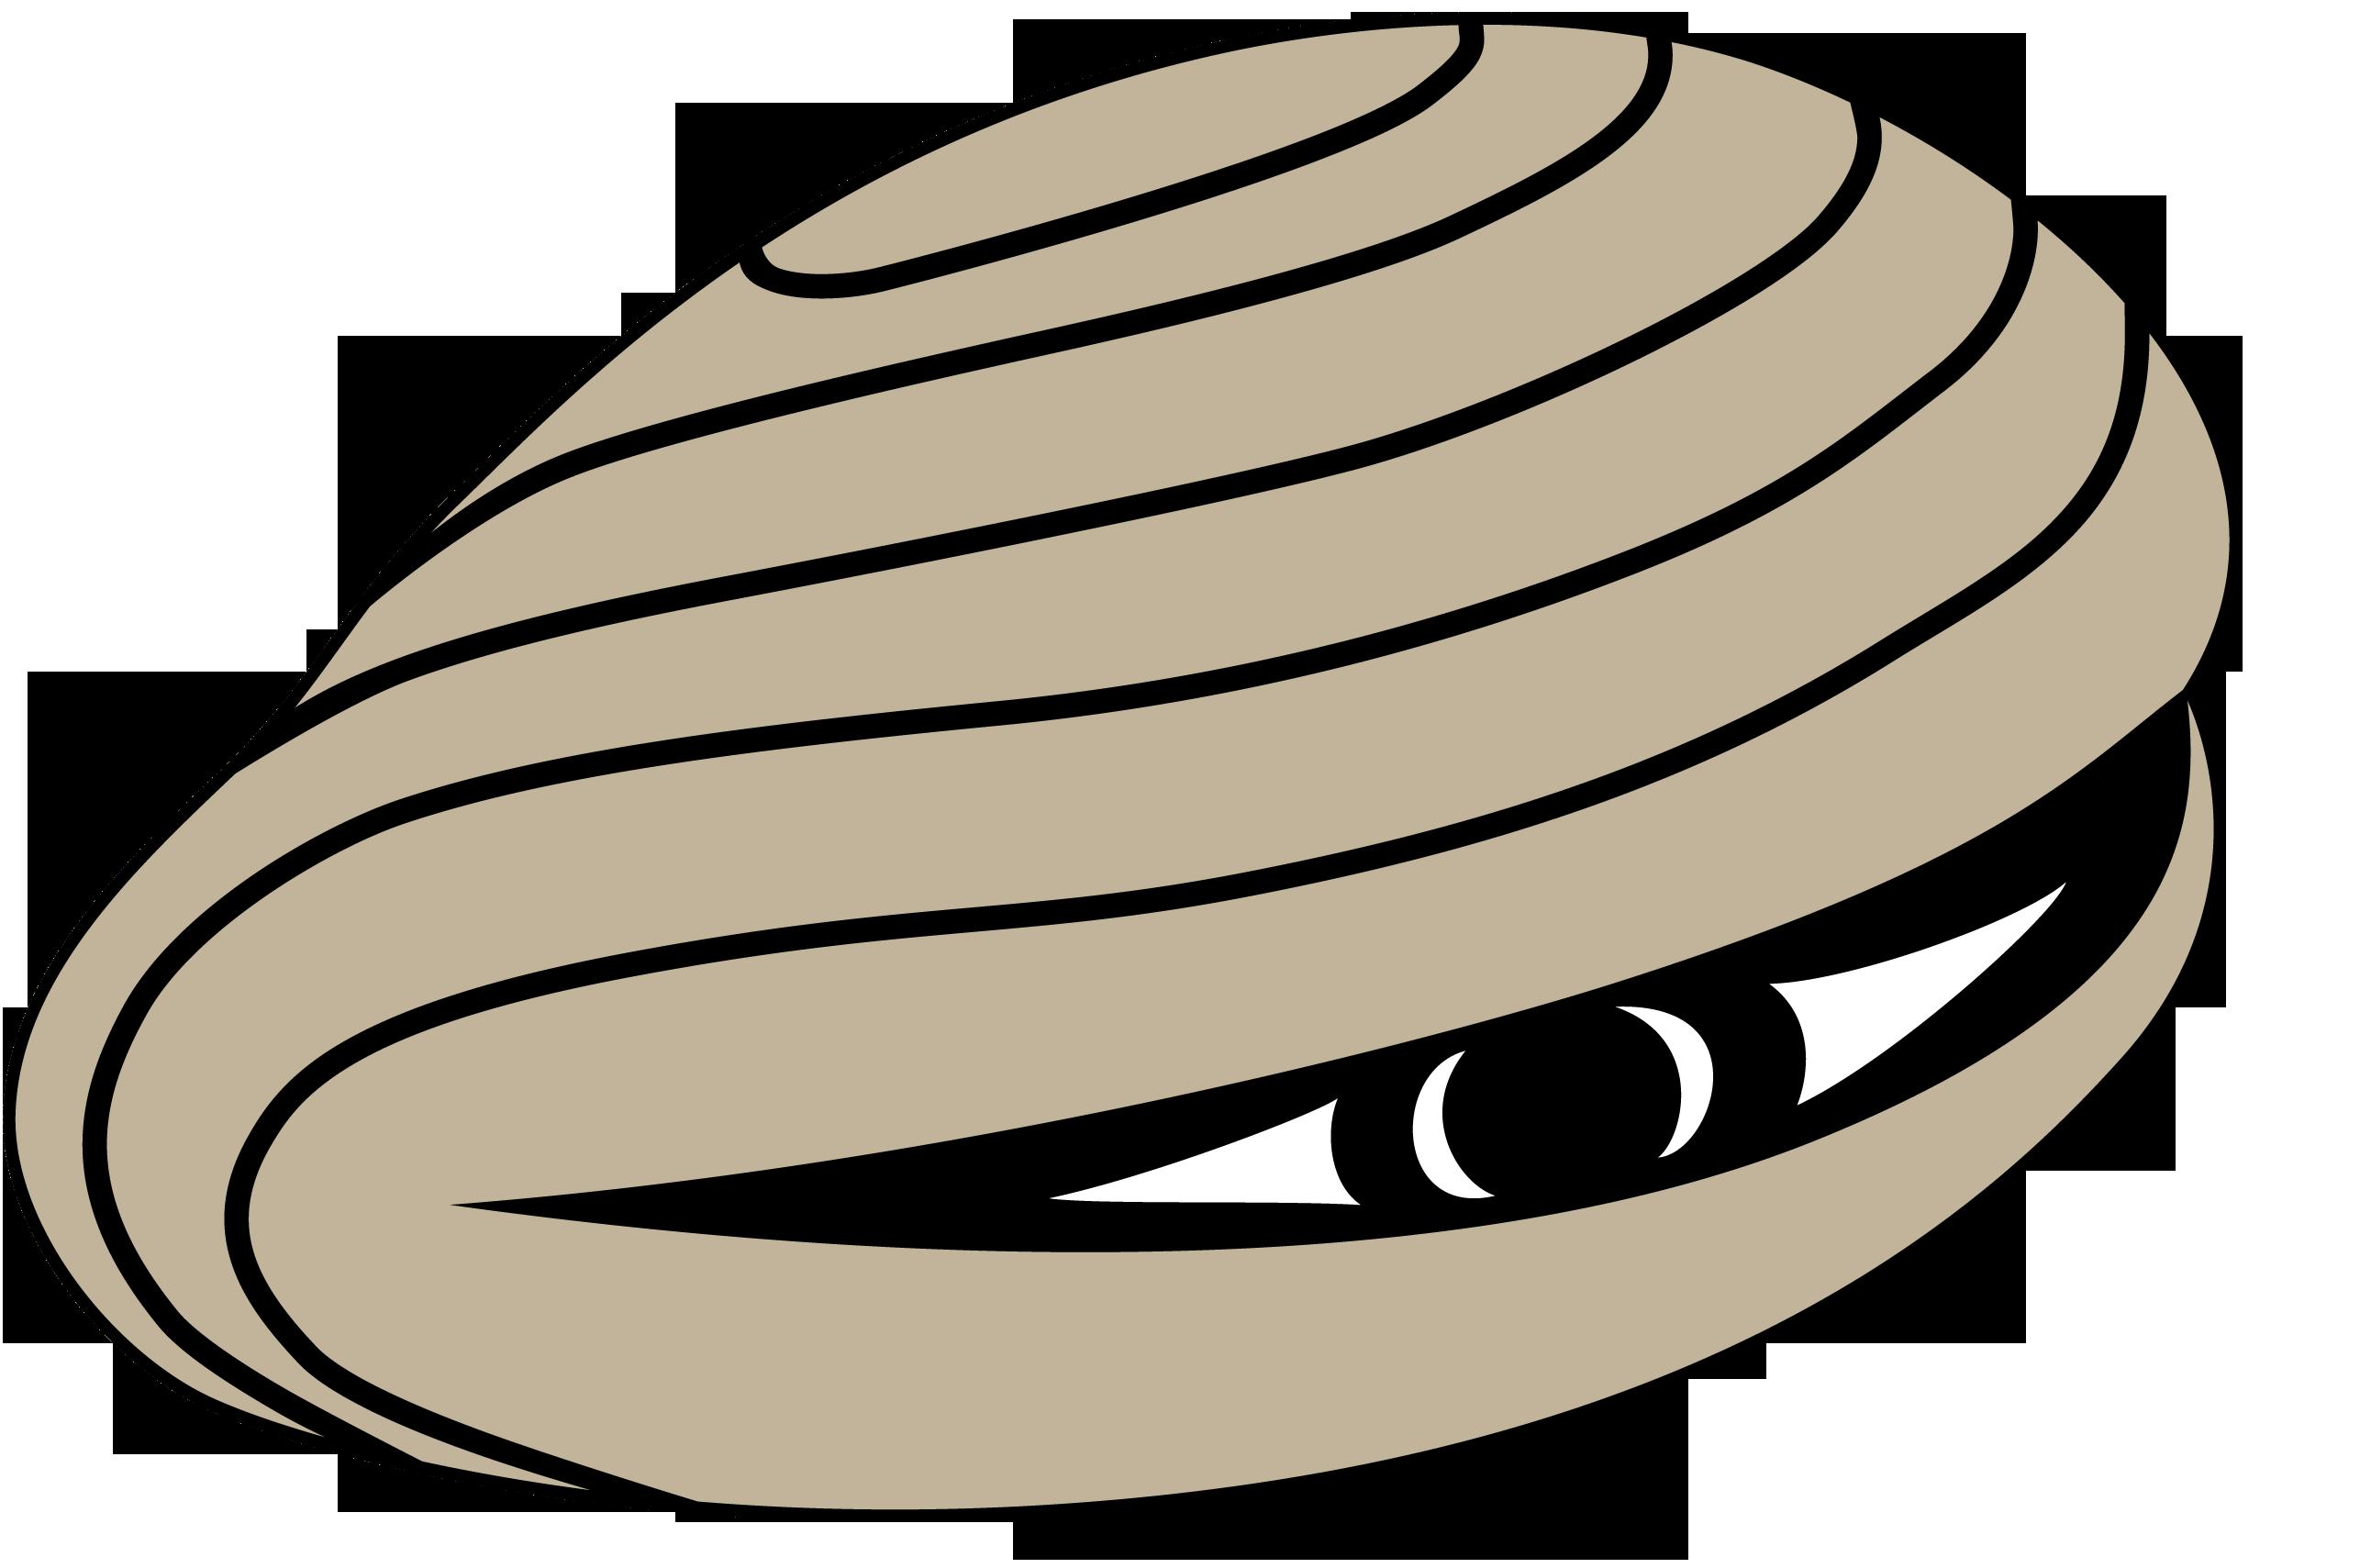 clam-s-axwa